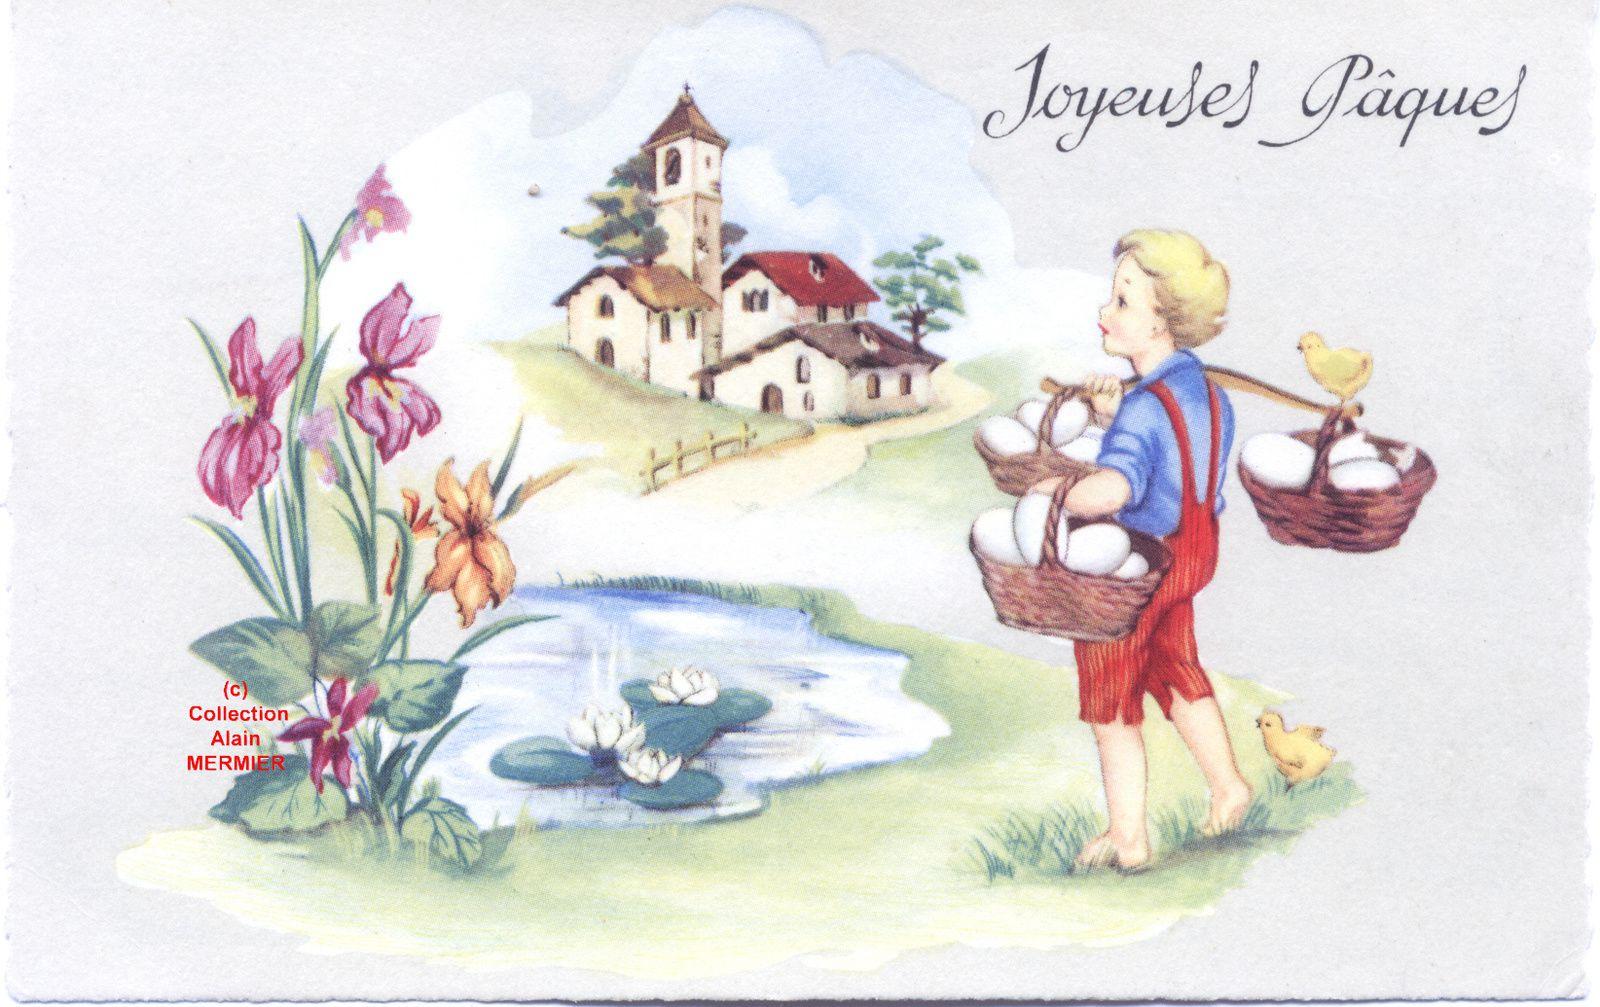 Iris -1954- Carte postale semi-moderne. Joyeuses Pâques. France.